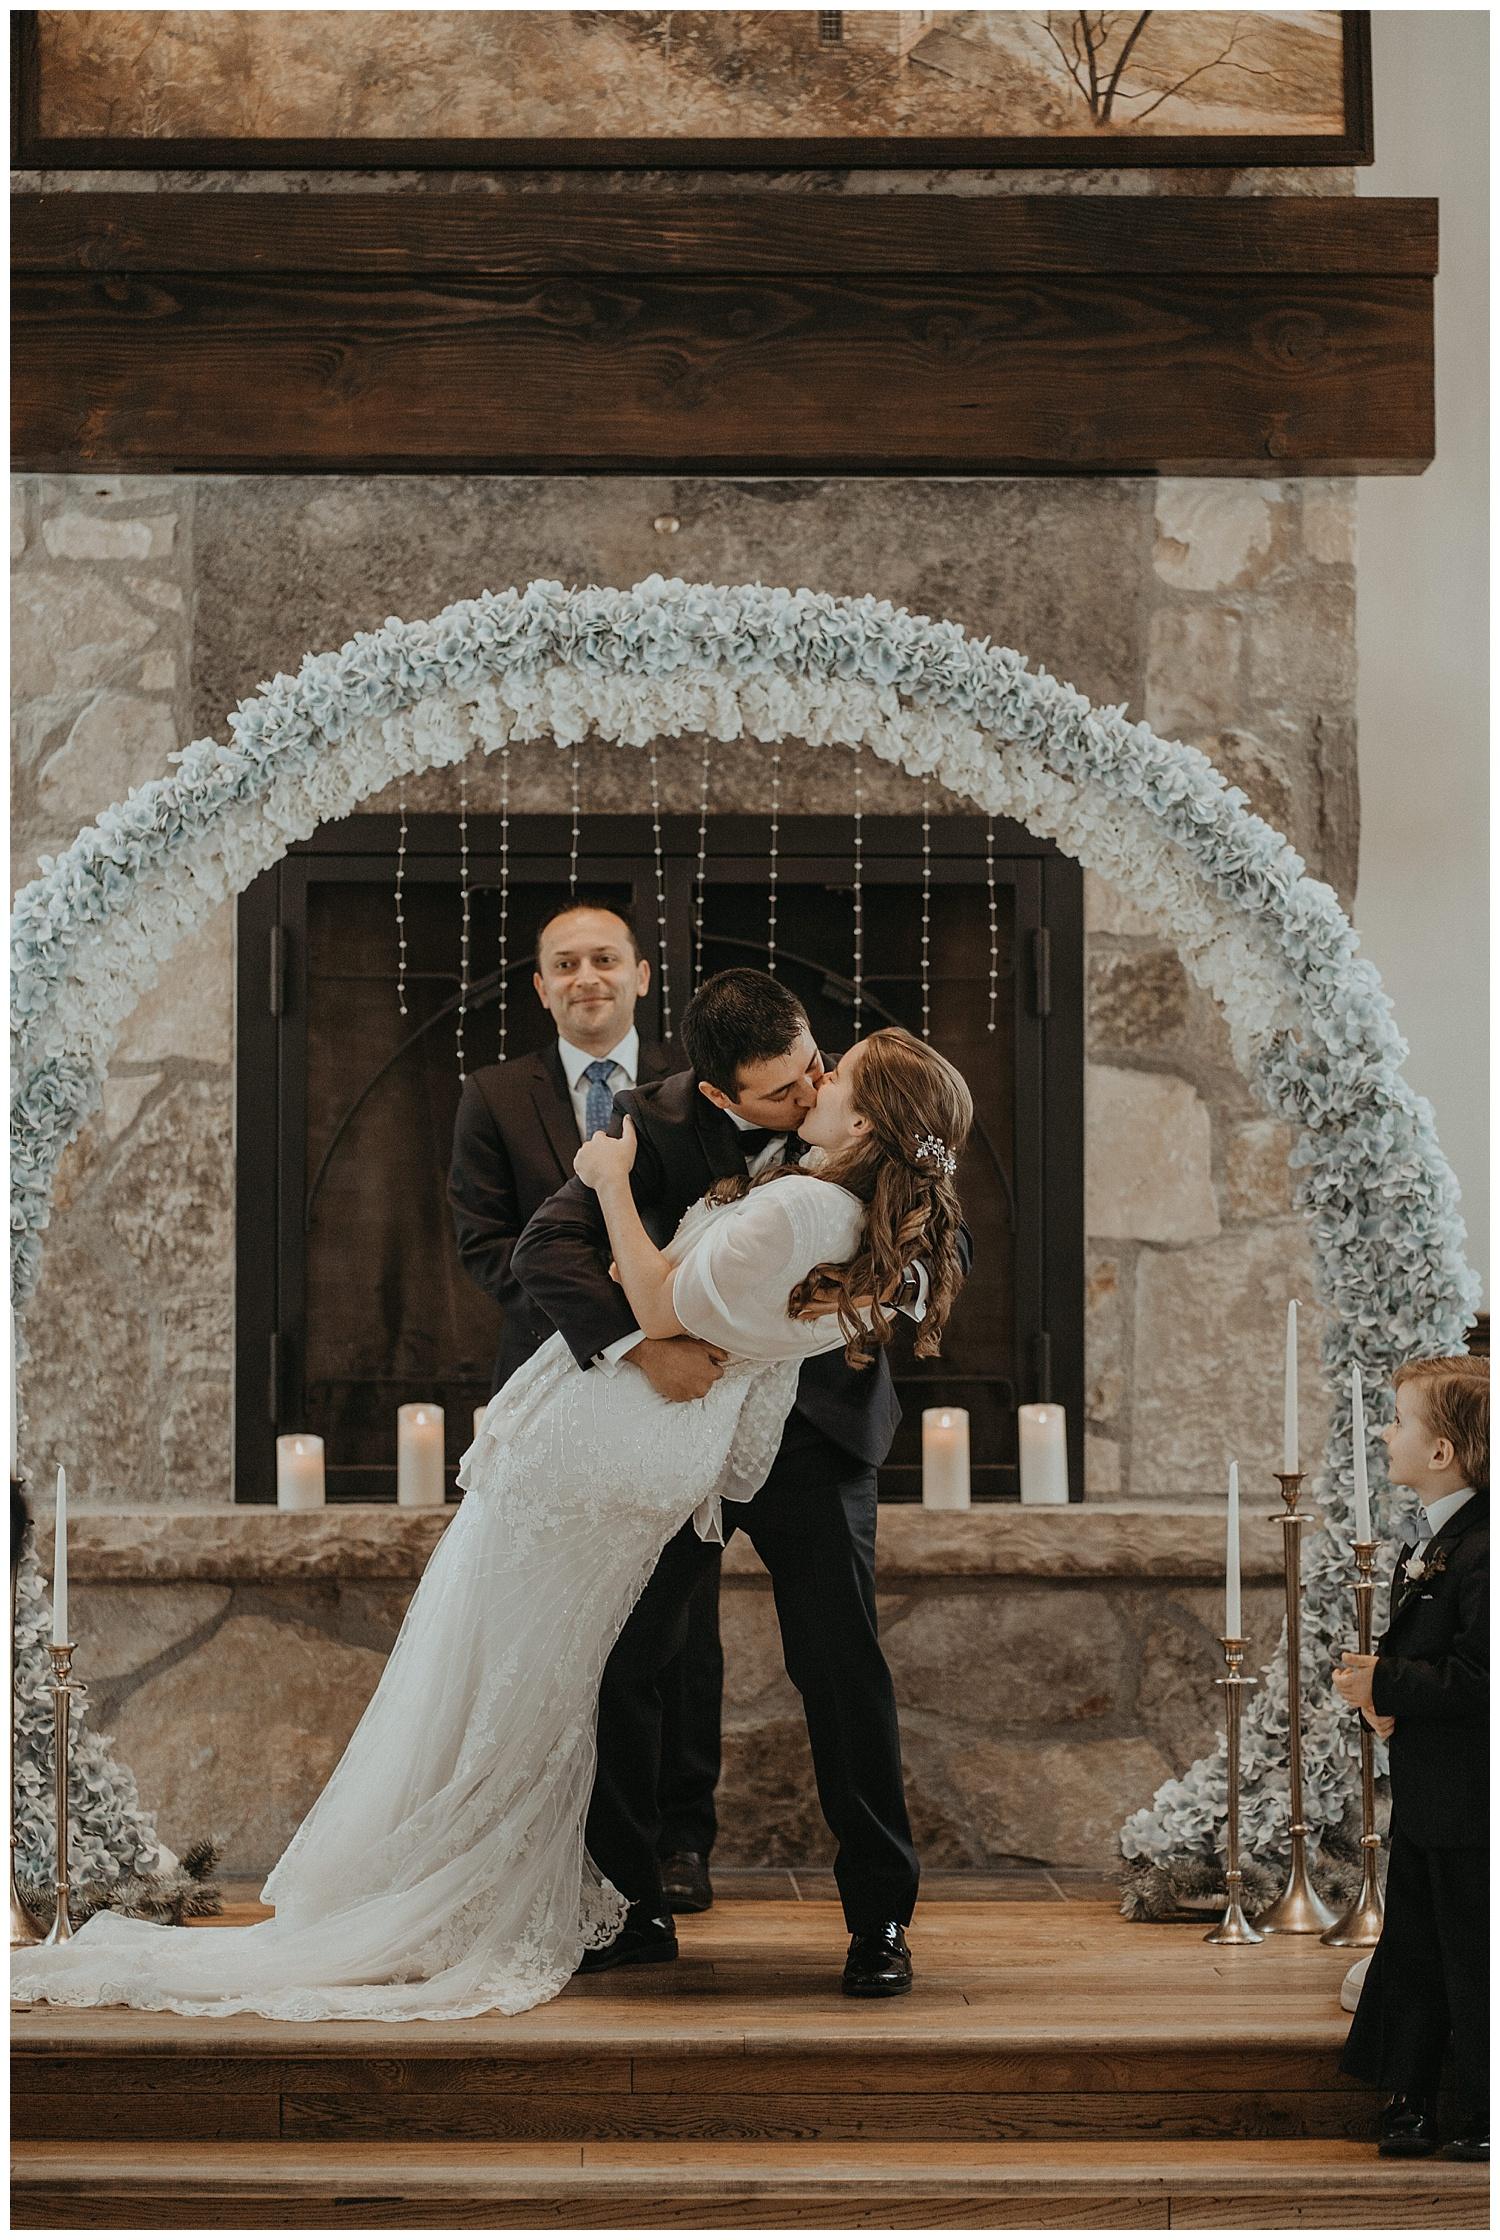 Katie Marie Photography | Hamilton Ontario Wedding Photographer | Ancaster Mill Winter Wedding | Oakville Conference Centre Wedding | RBG Wedding | Royal Botanical Gardens Wedding_0150.jpg